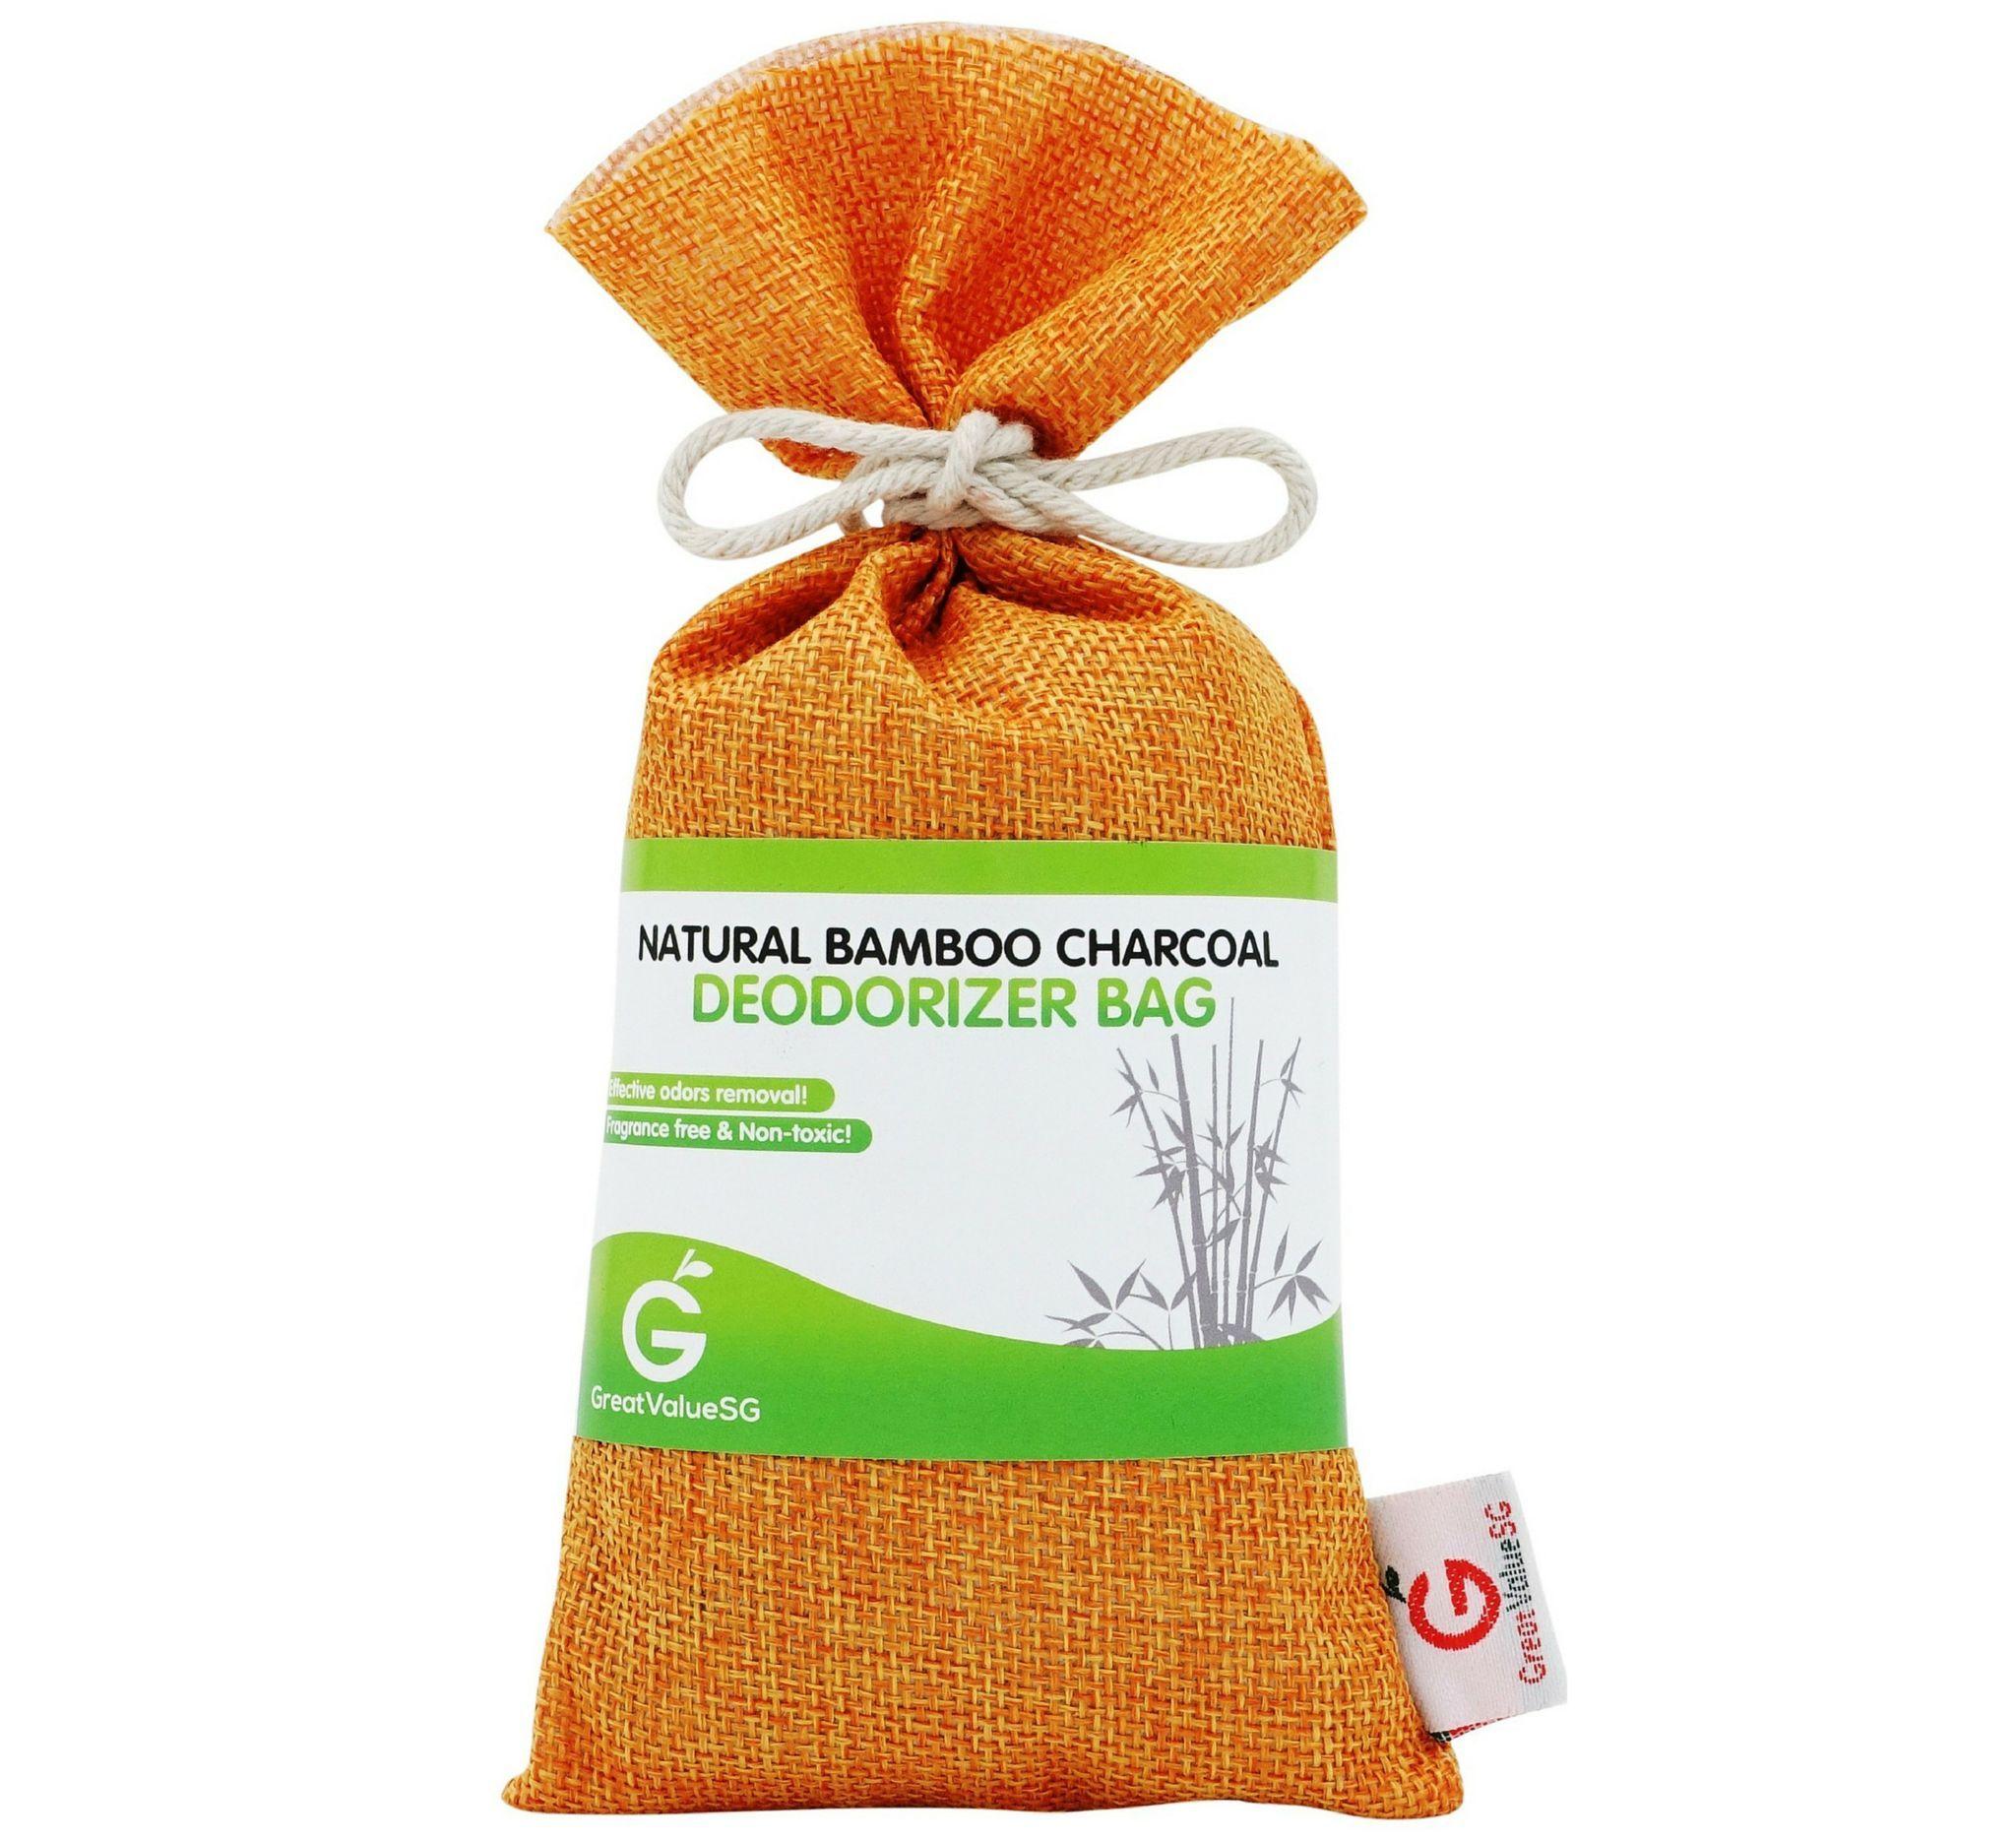 Bamboo Charcoal Deodorizer Bag